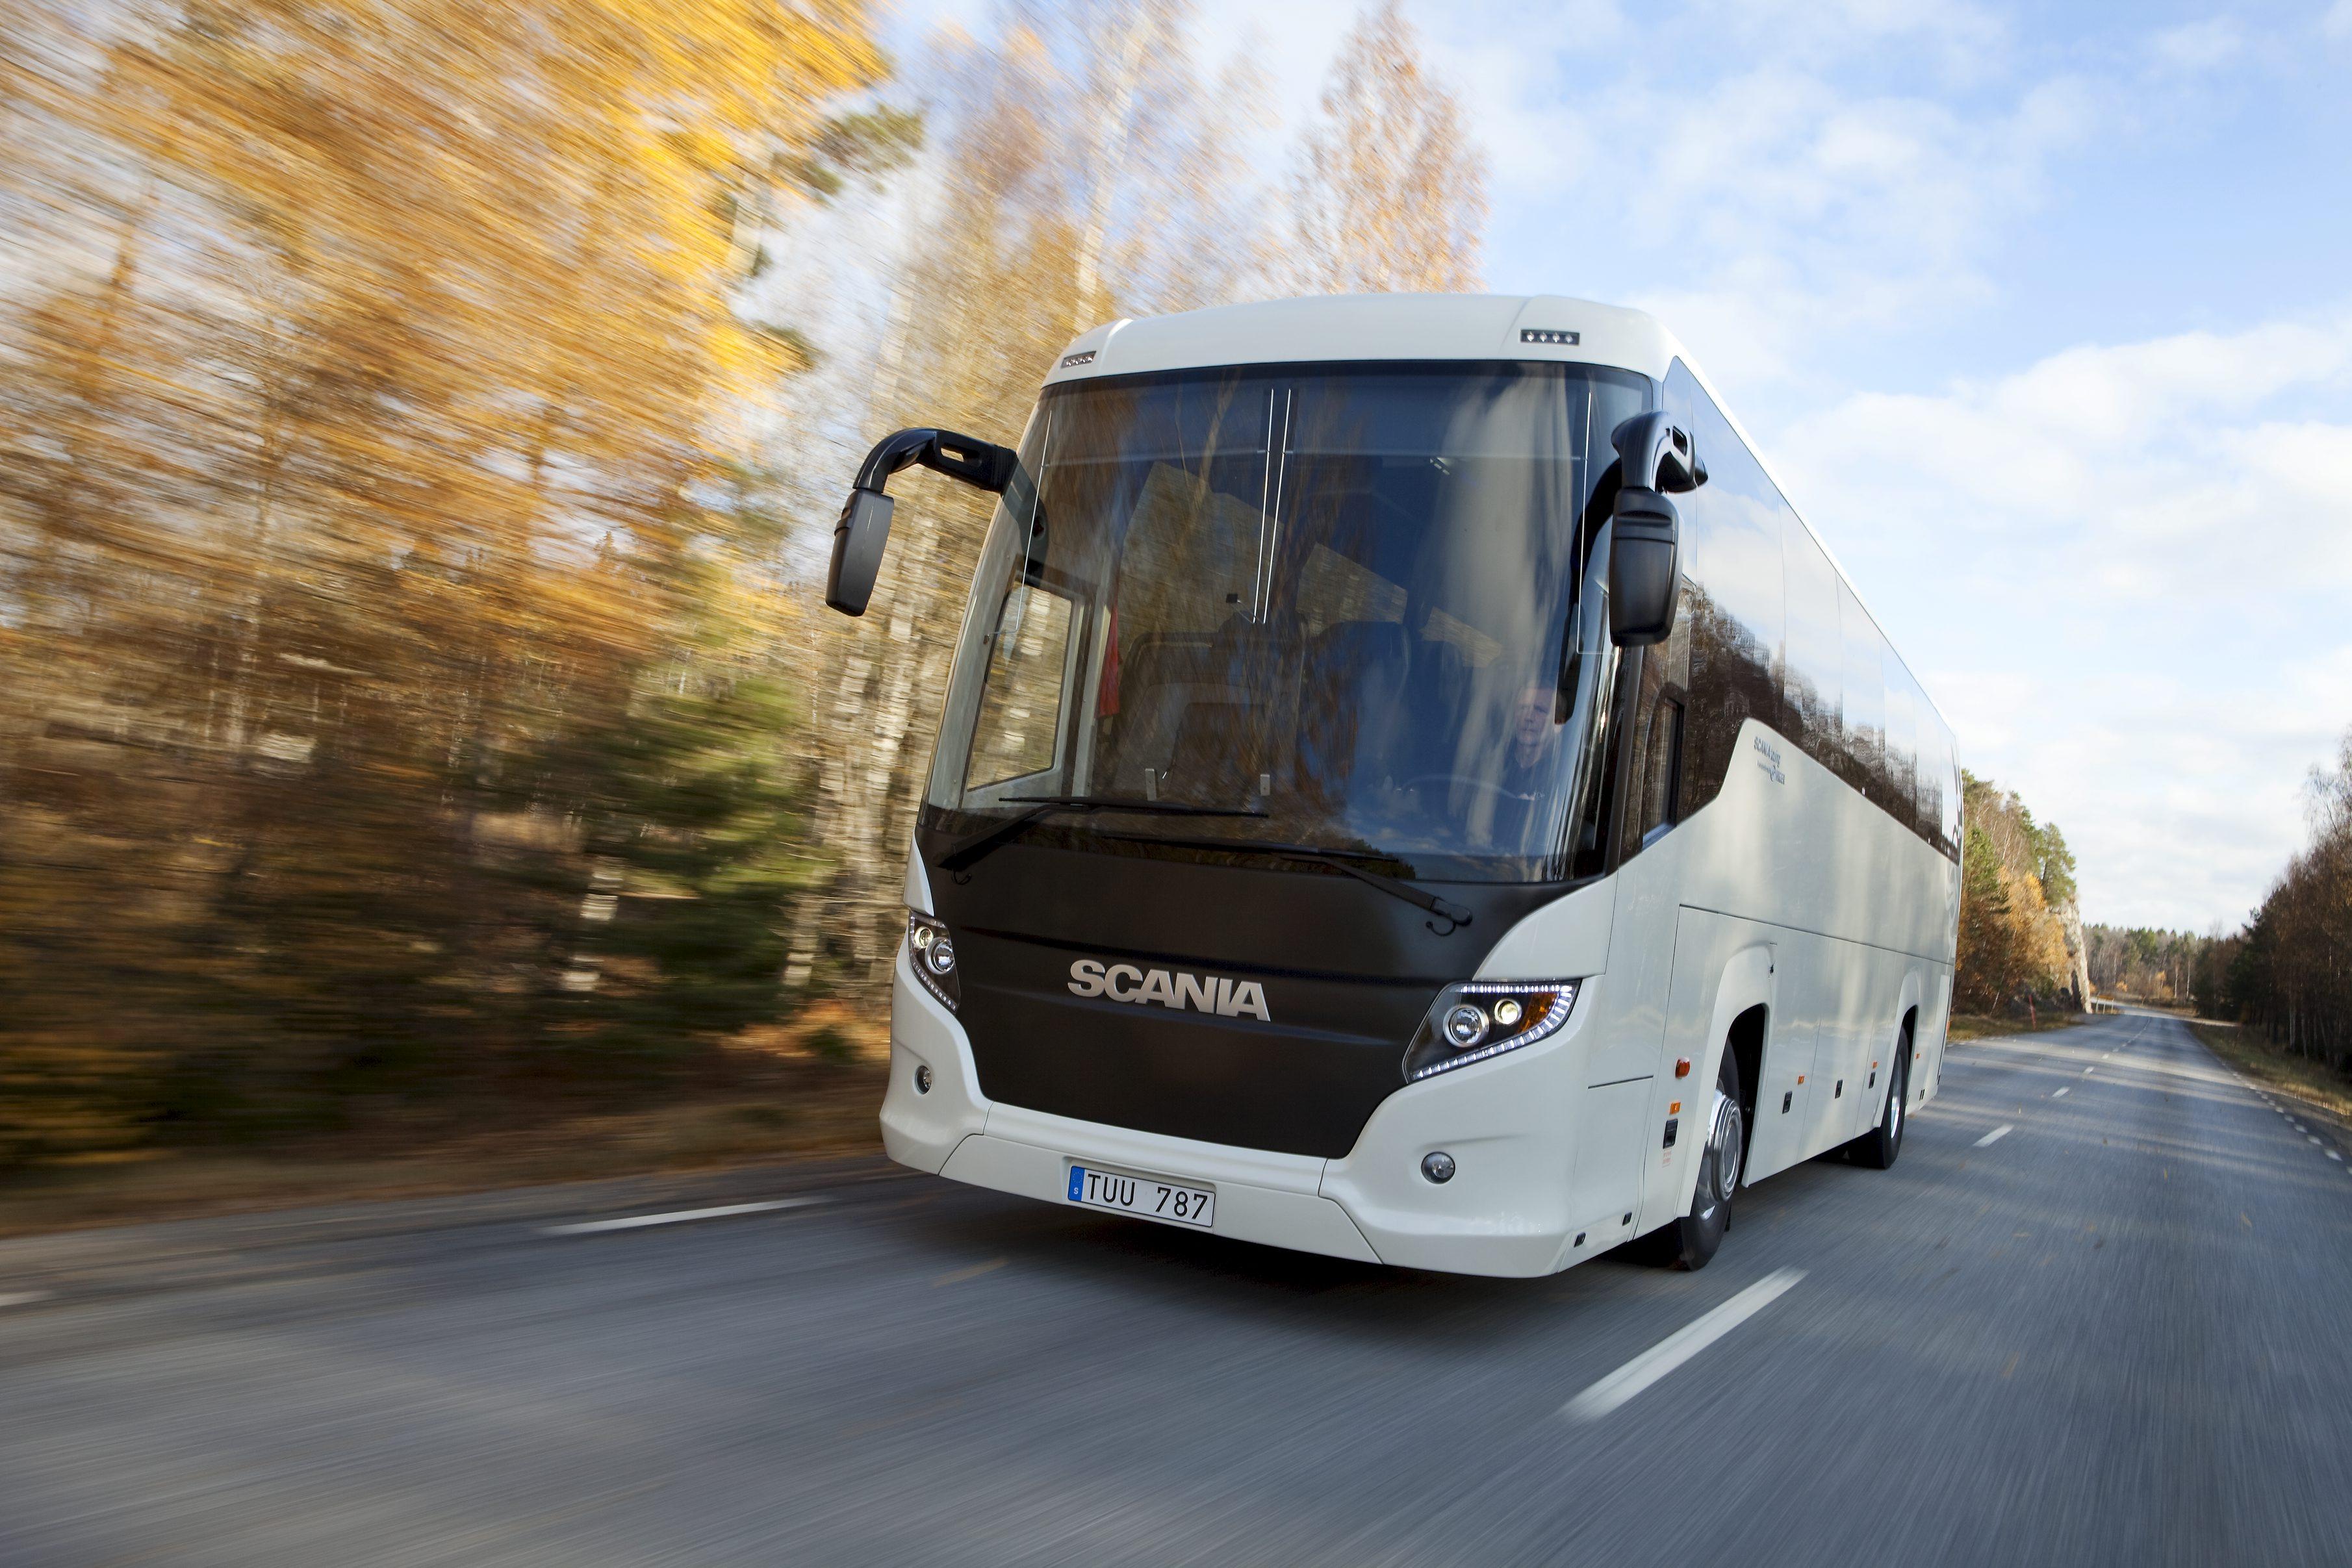 Картинки с автобусами и маршрутками